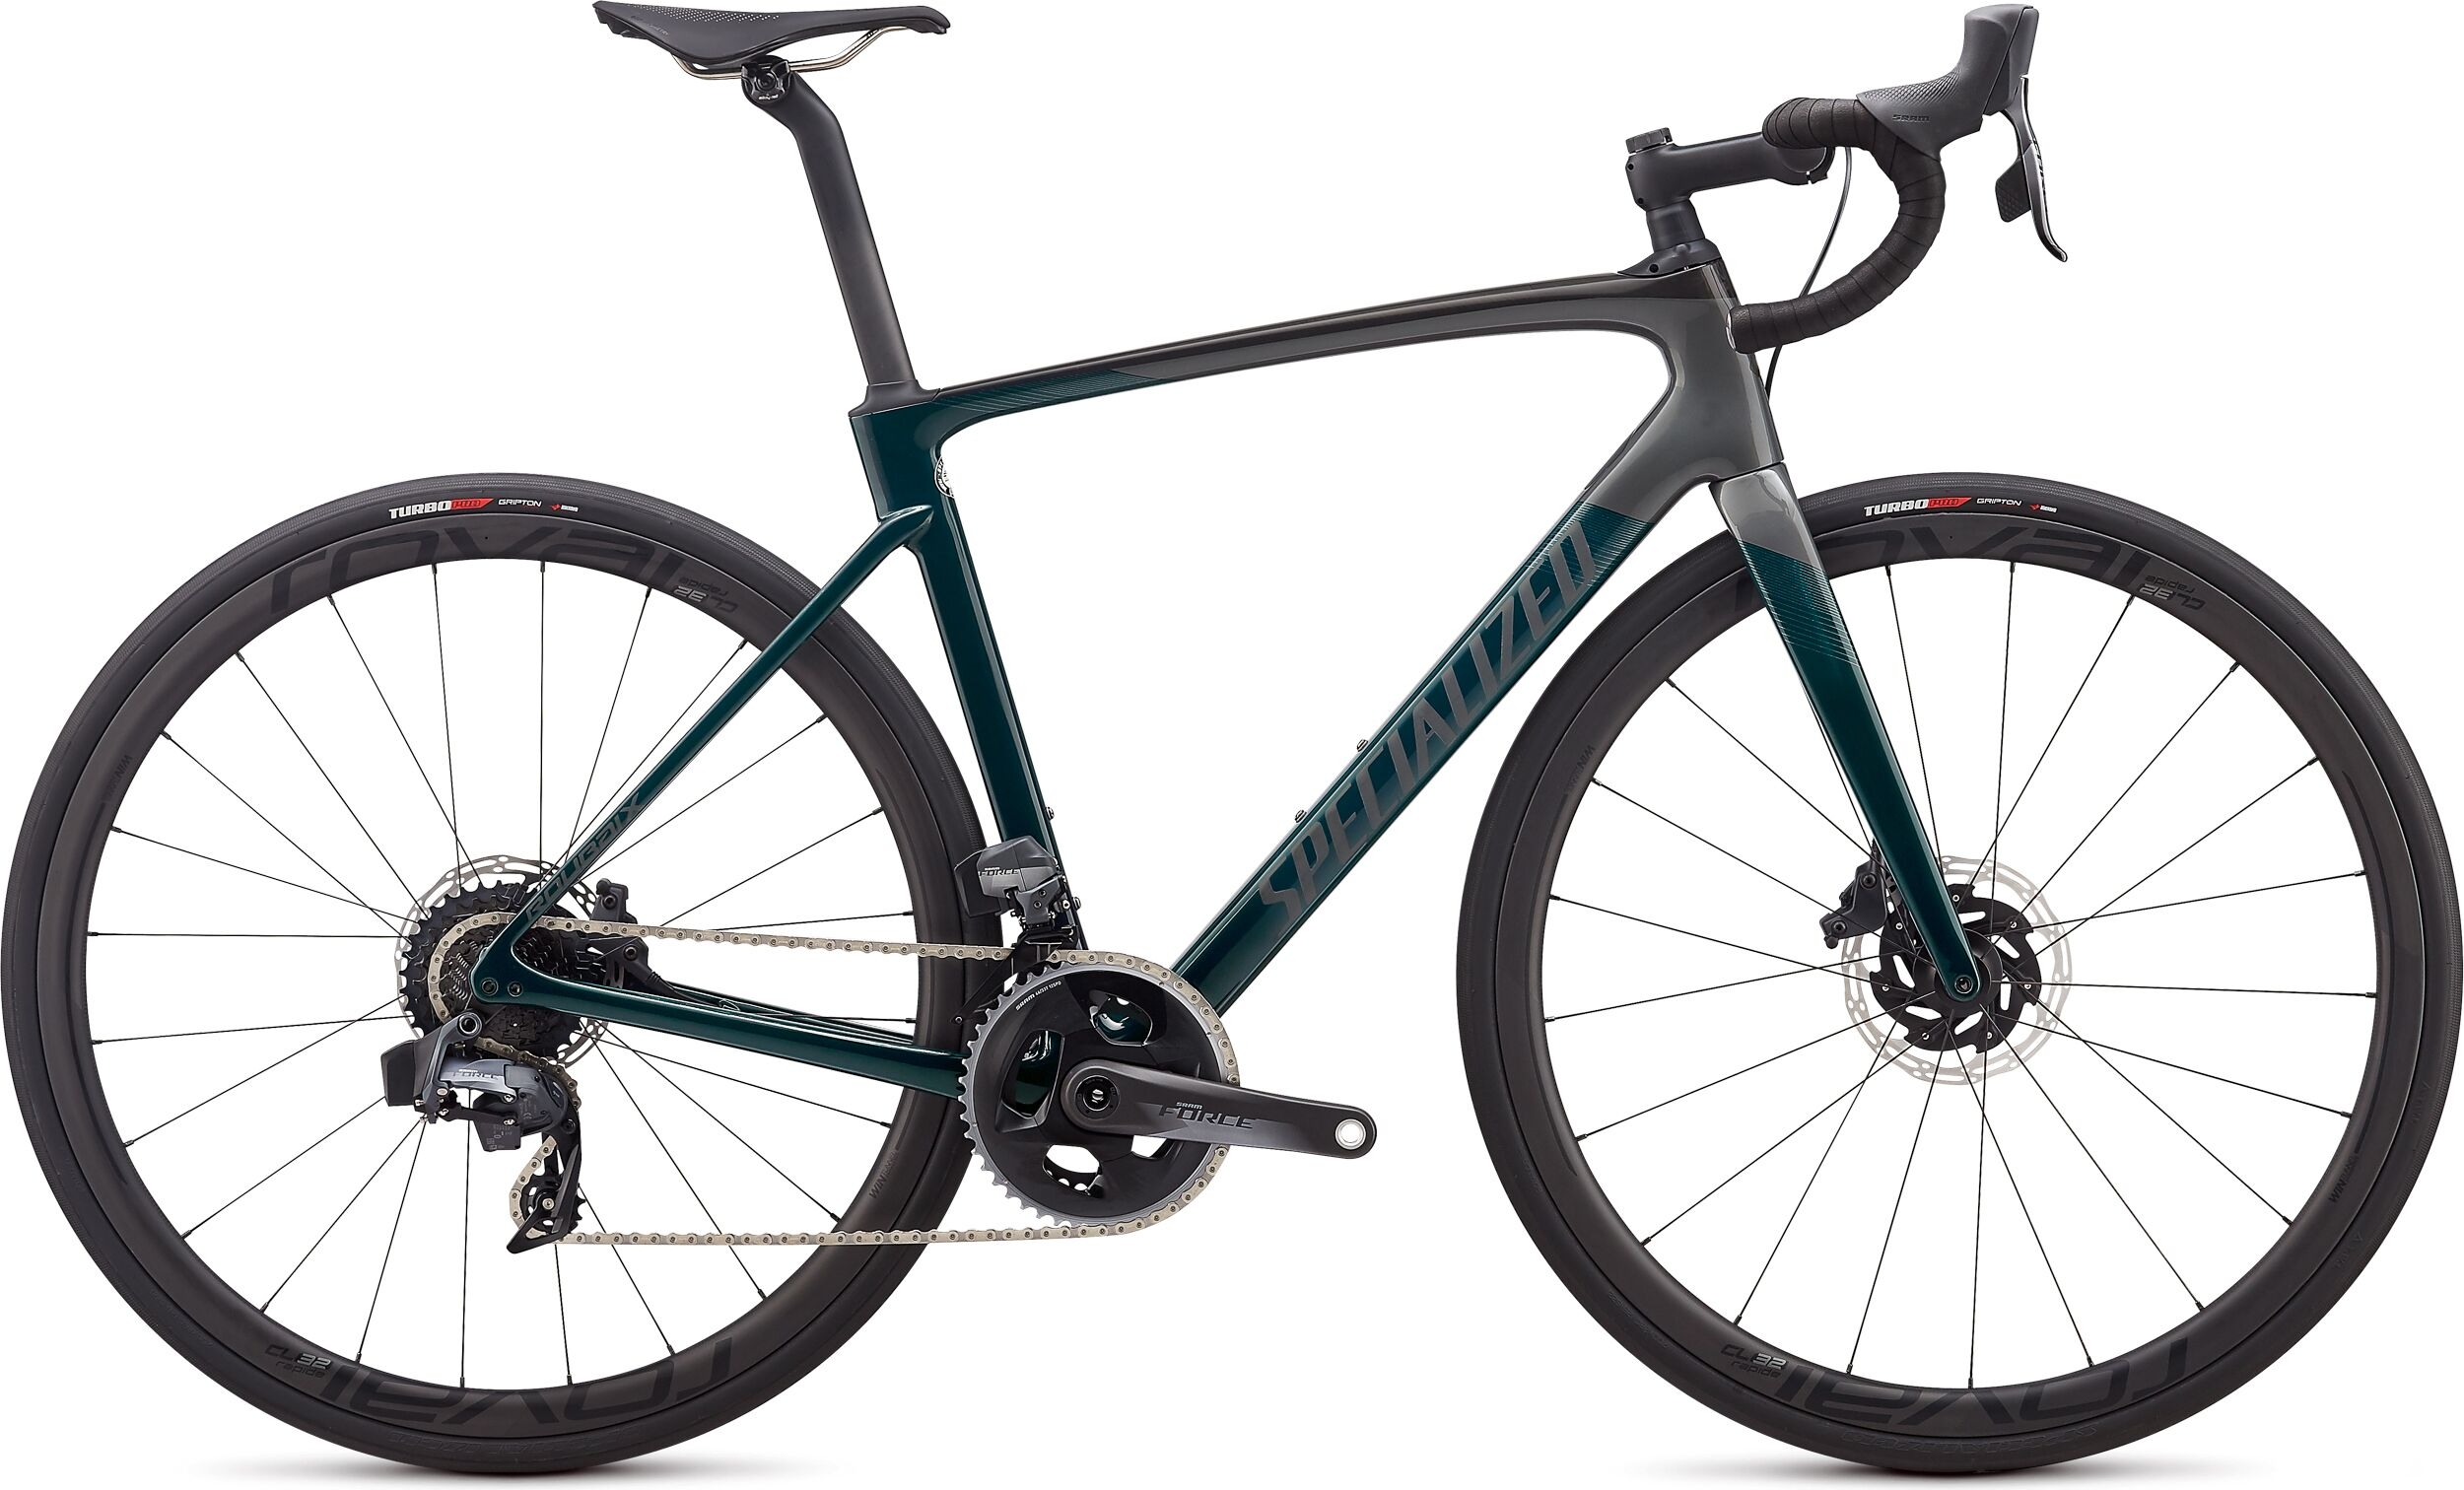 Specialized Roubaix Pro eTap AXS Road Bike 2020 Teal Tint/Charcoal